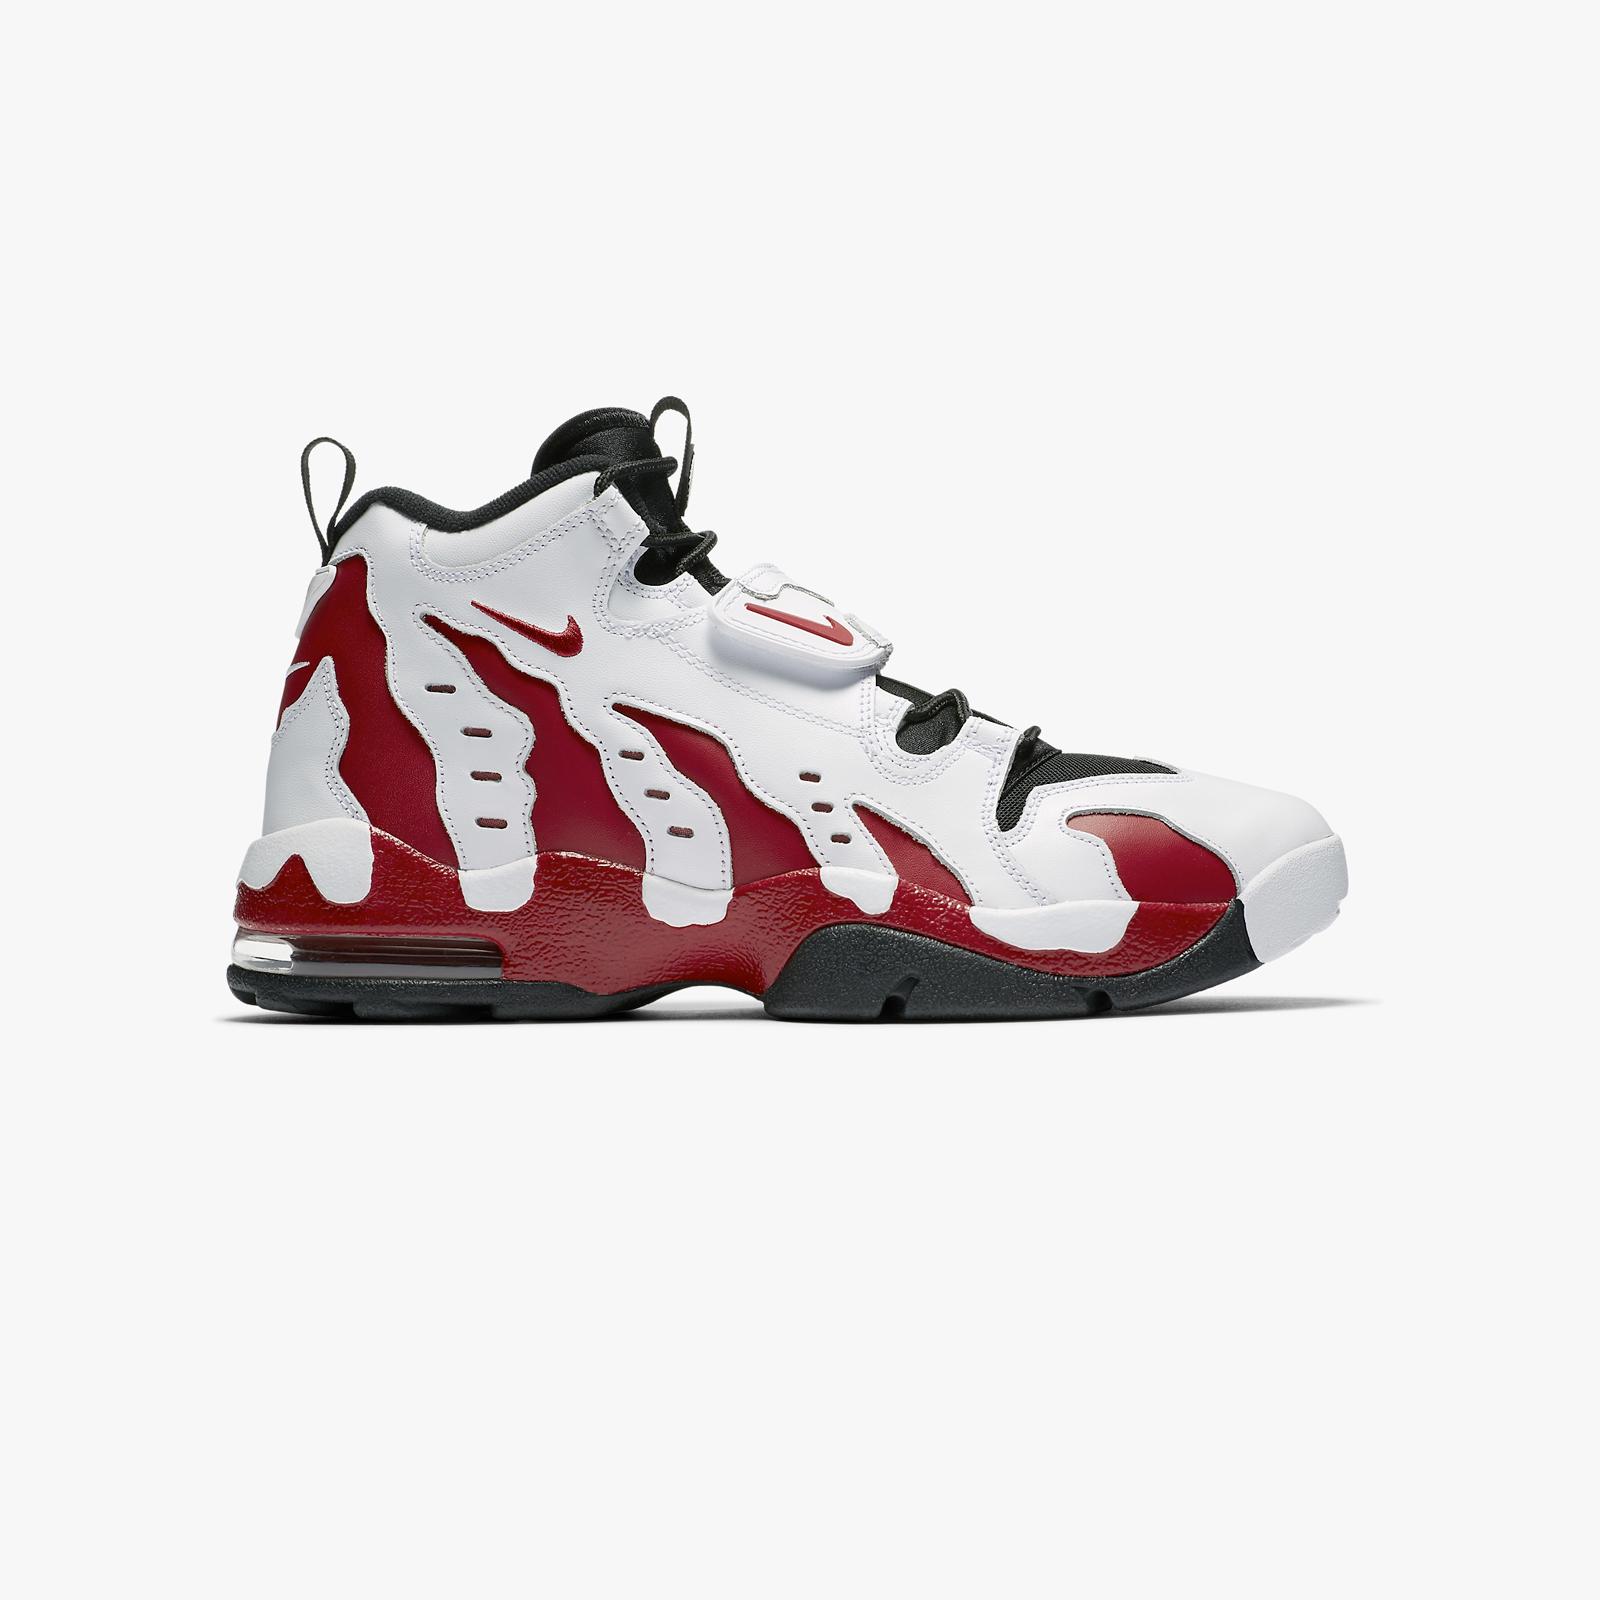 2ecdd65210f3fe Nike Air DT Max 96 - 316408-161 - Sneakersnstuff